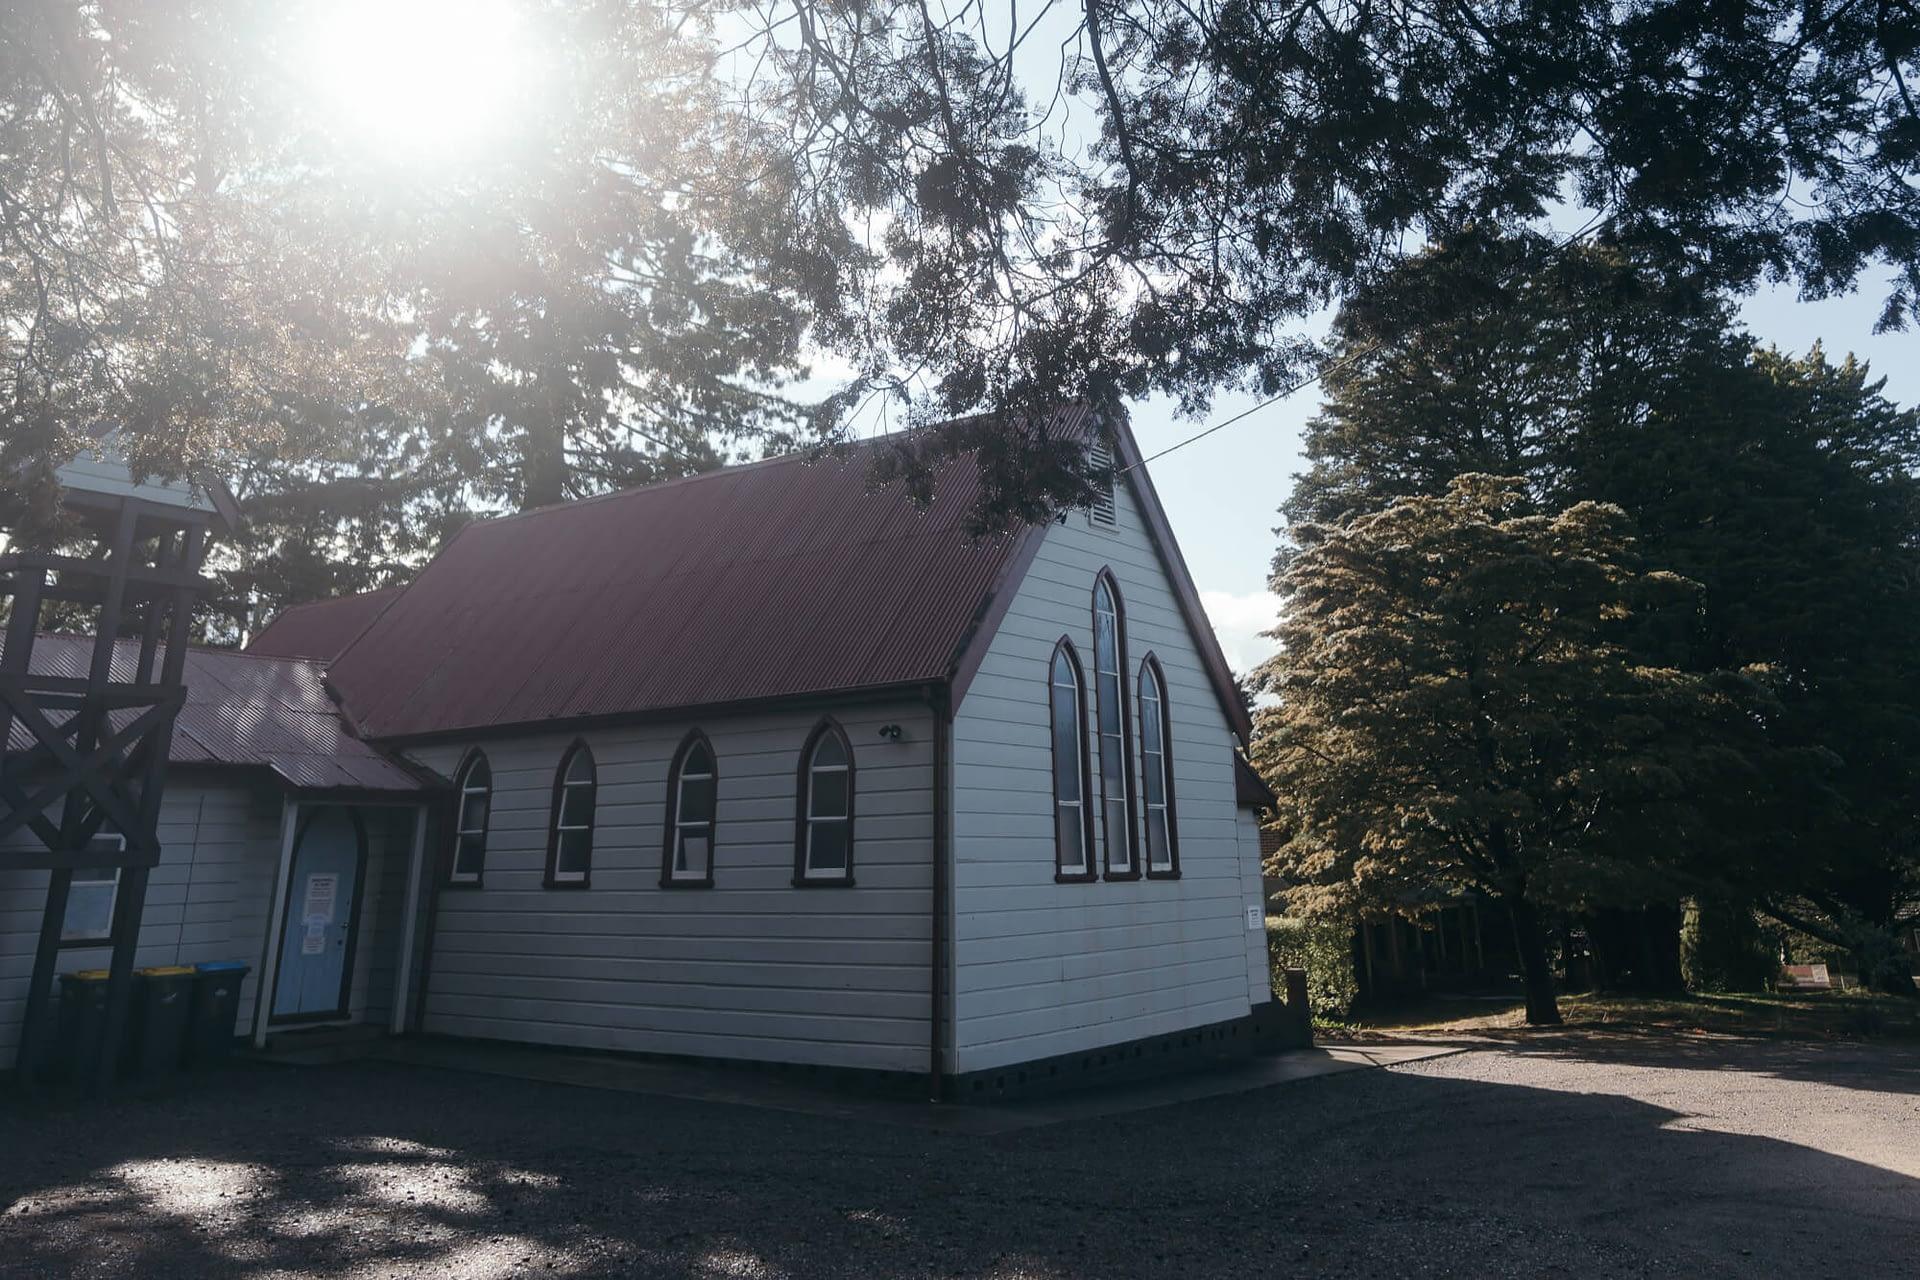 basecamp-2020-livestream-holy-trinity-wentworth-falls-church-building.jpg